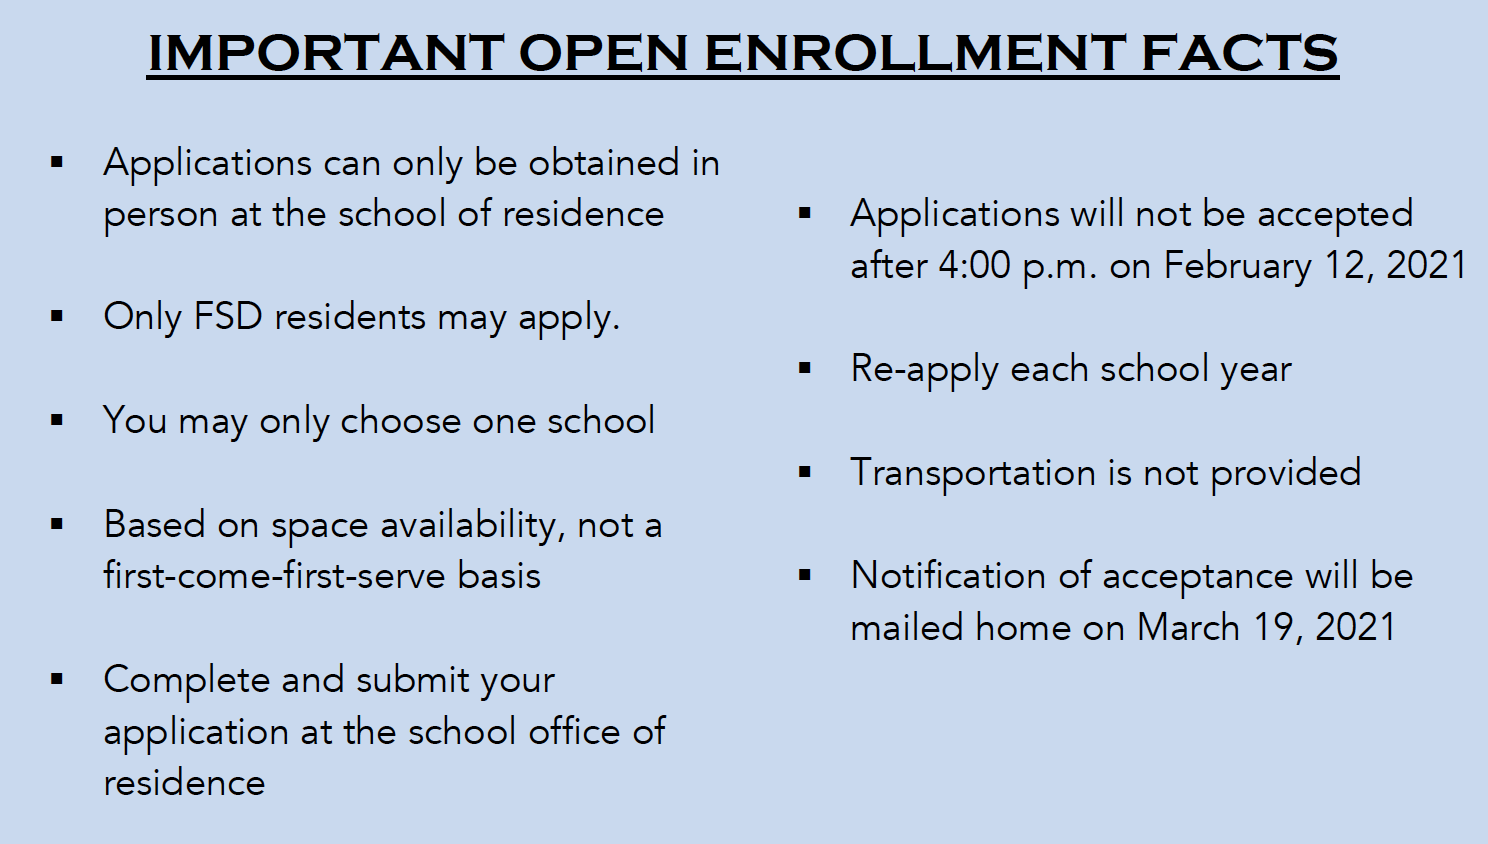 Important Facts - Open Enrollment